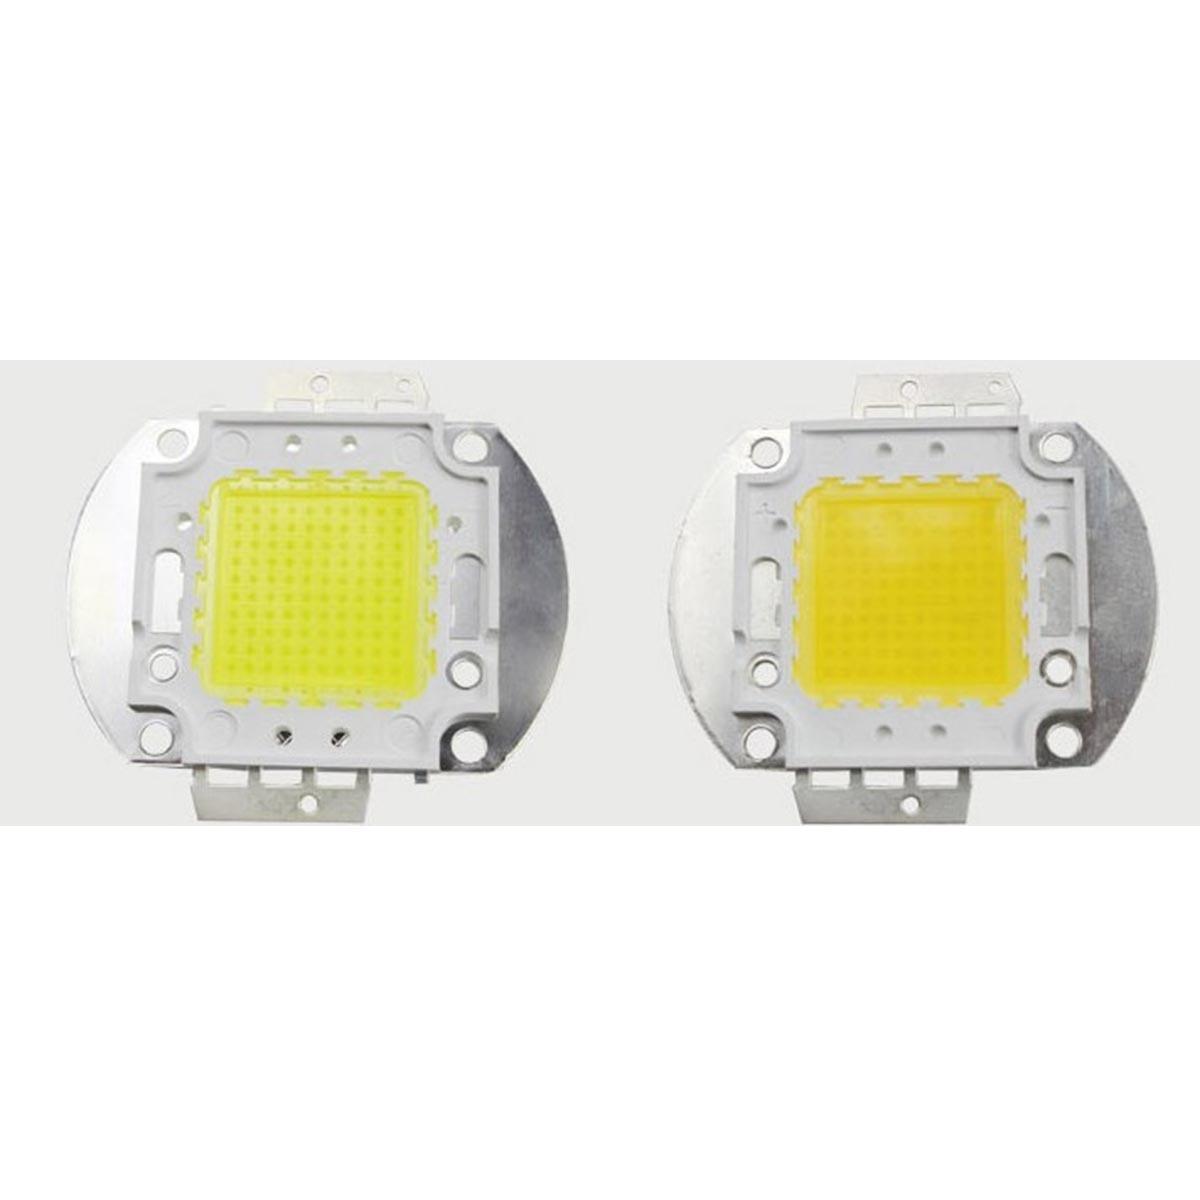 Warm Cold 10 W 20W 30W  led Chip DC 12 V 36 V COB  LED lamp Diodes DIY 50 W 100 W Schijnwerper Spotlight Lamp